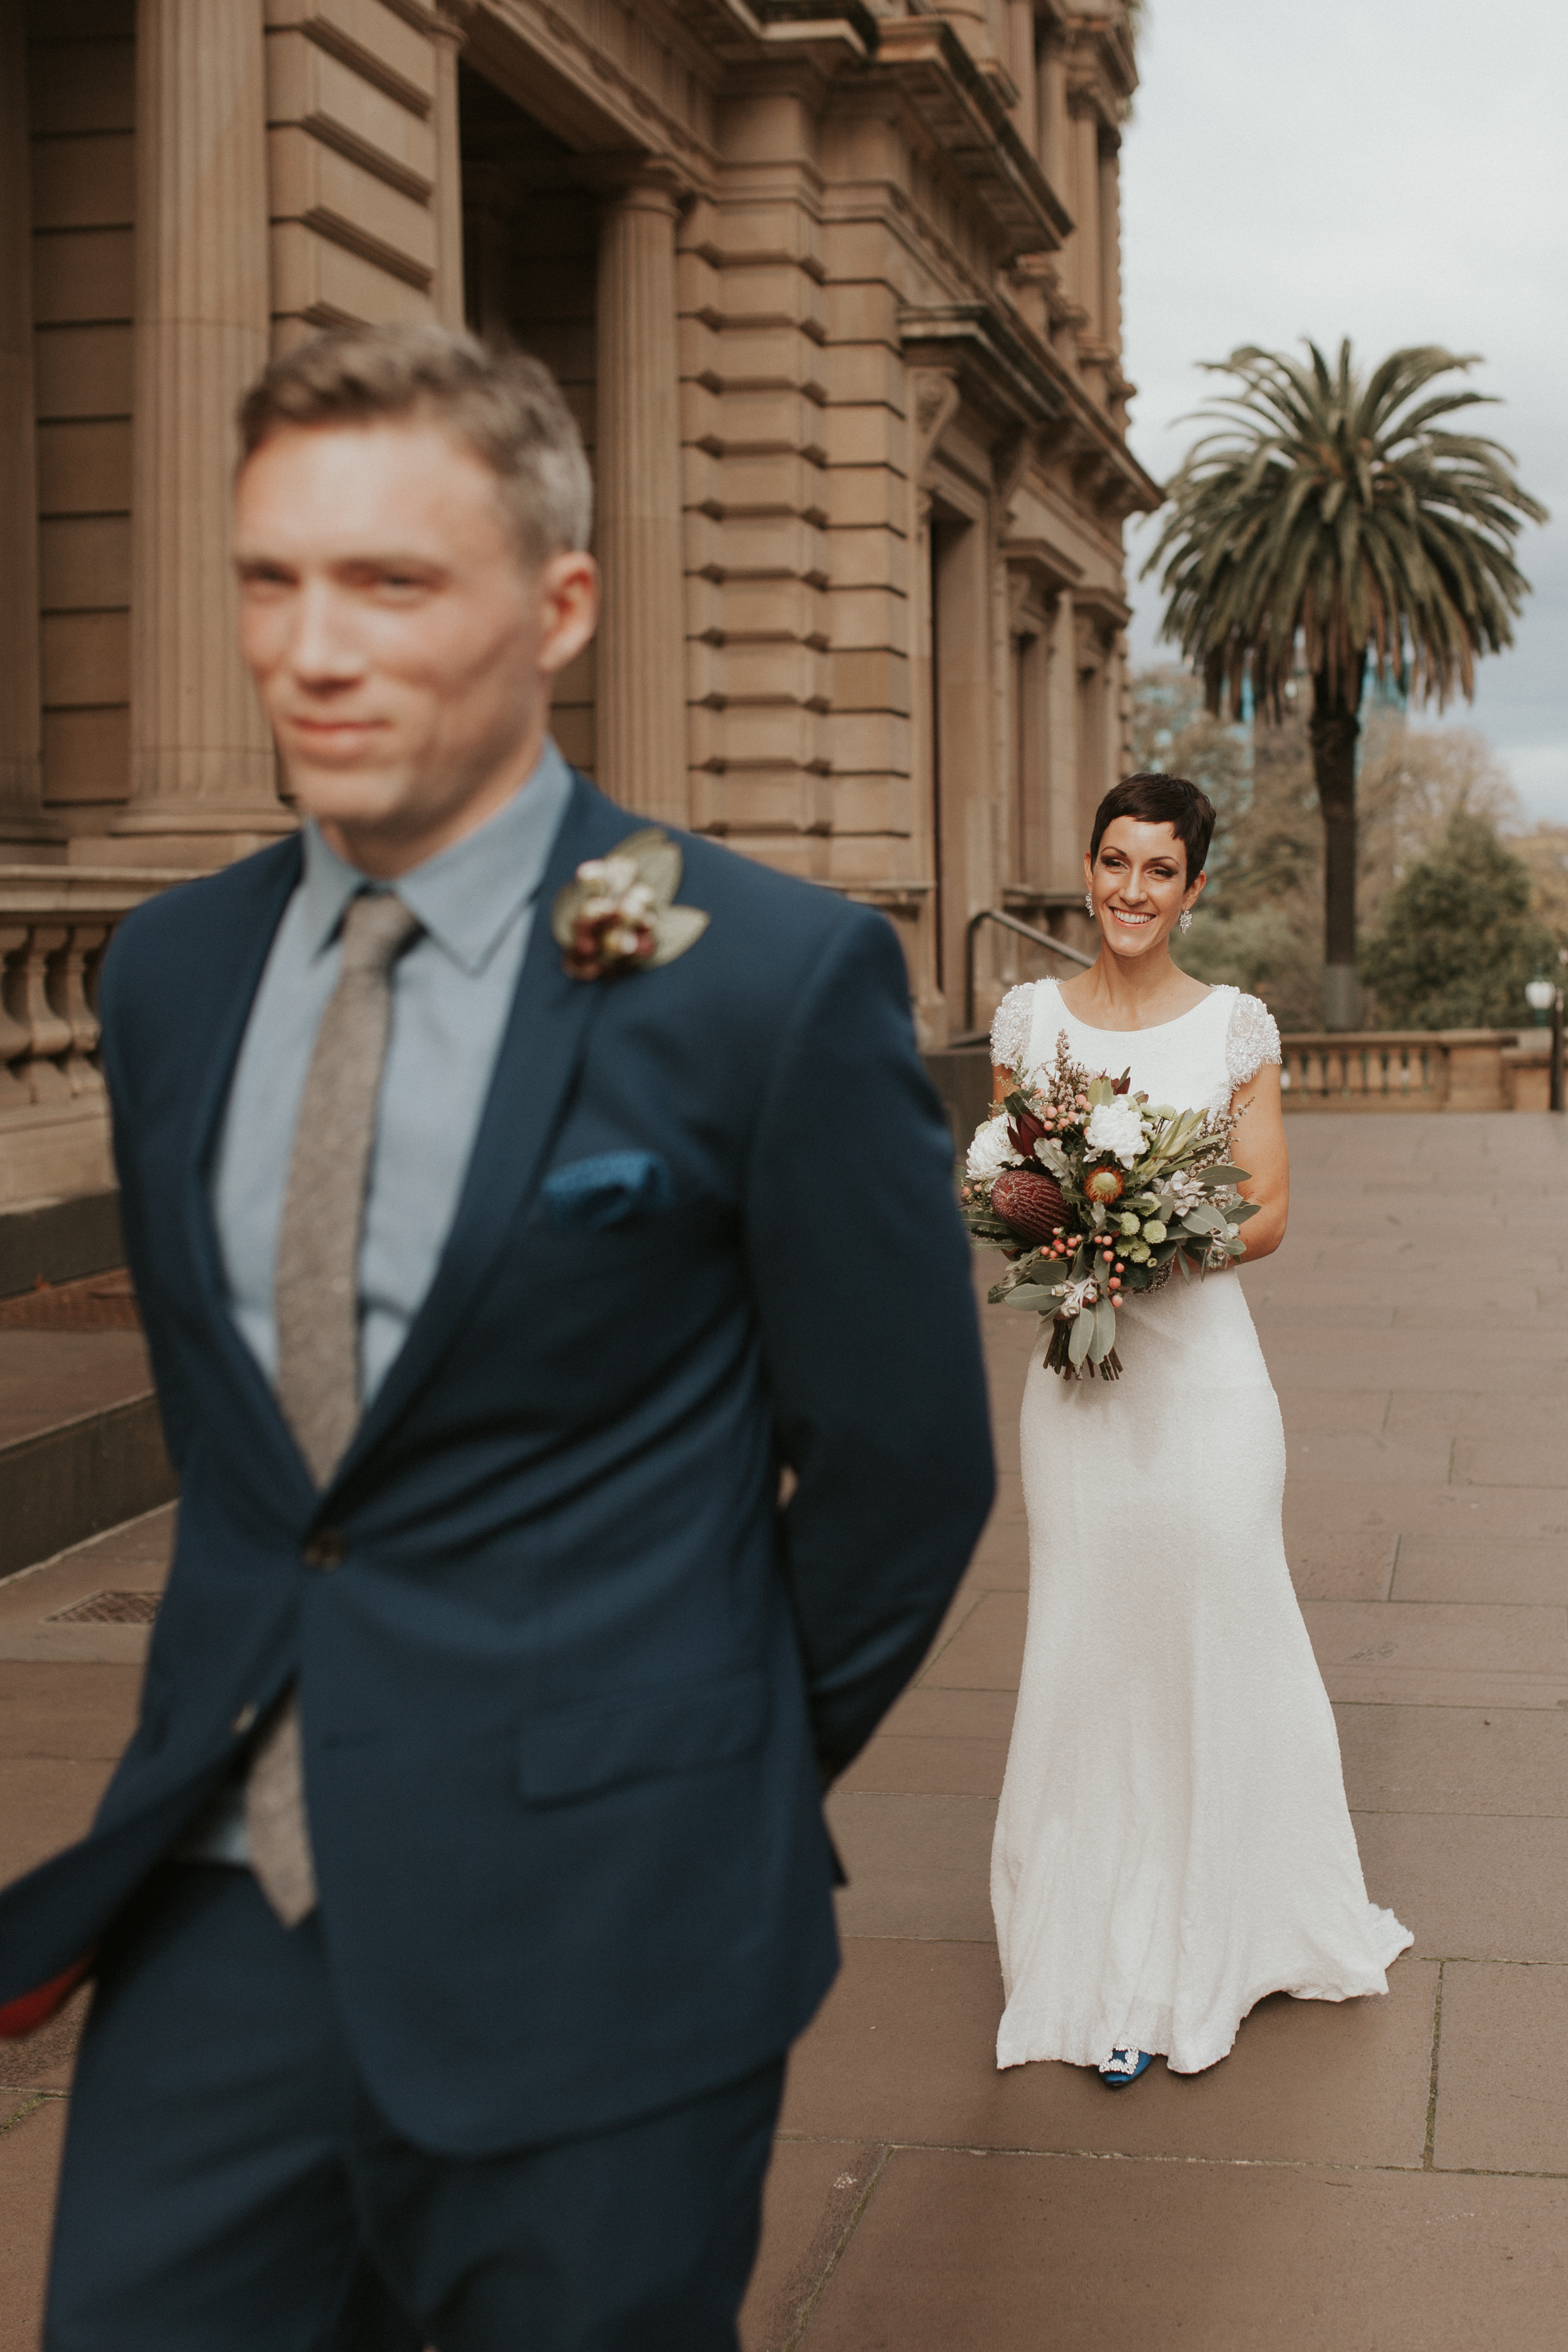 Melbourne-city-wedding-emotionsandmath-002.jpg